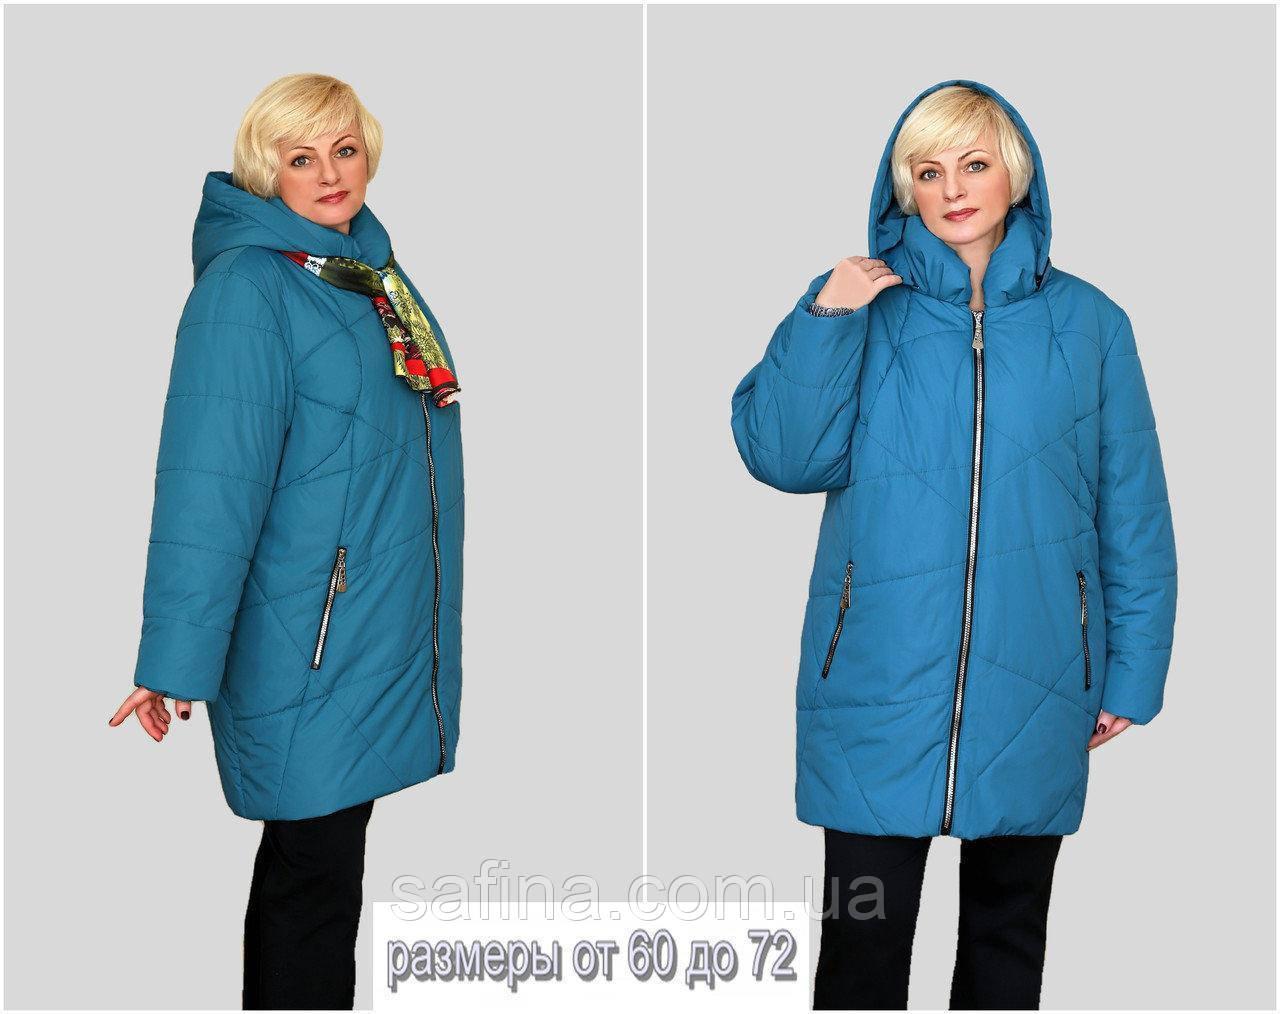 Красивая женская куртка супербатал до 72 размера